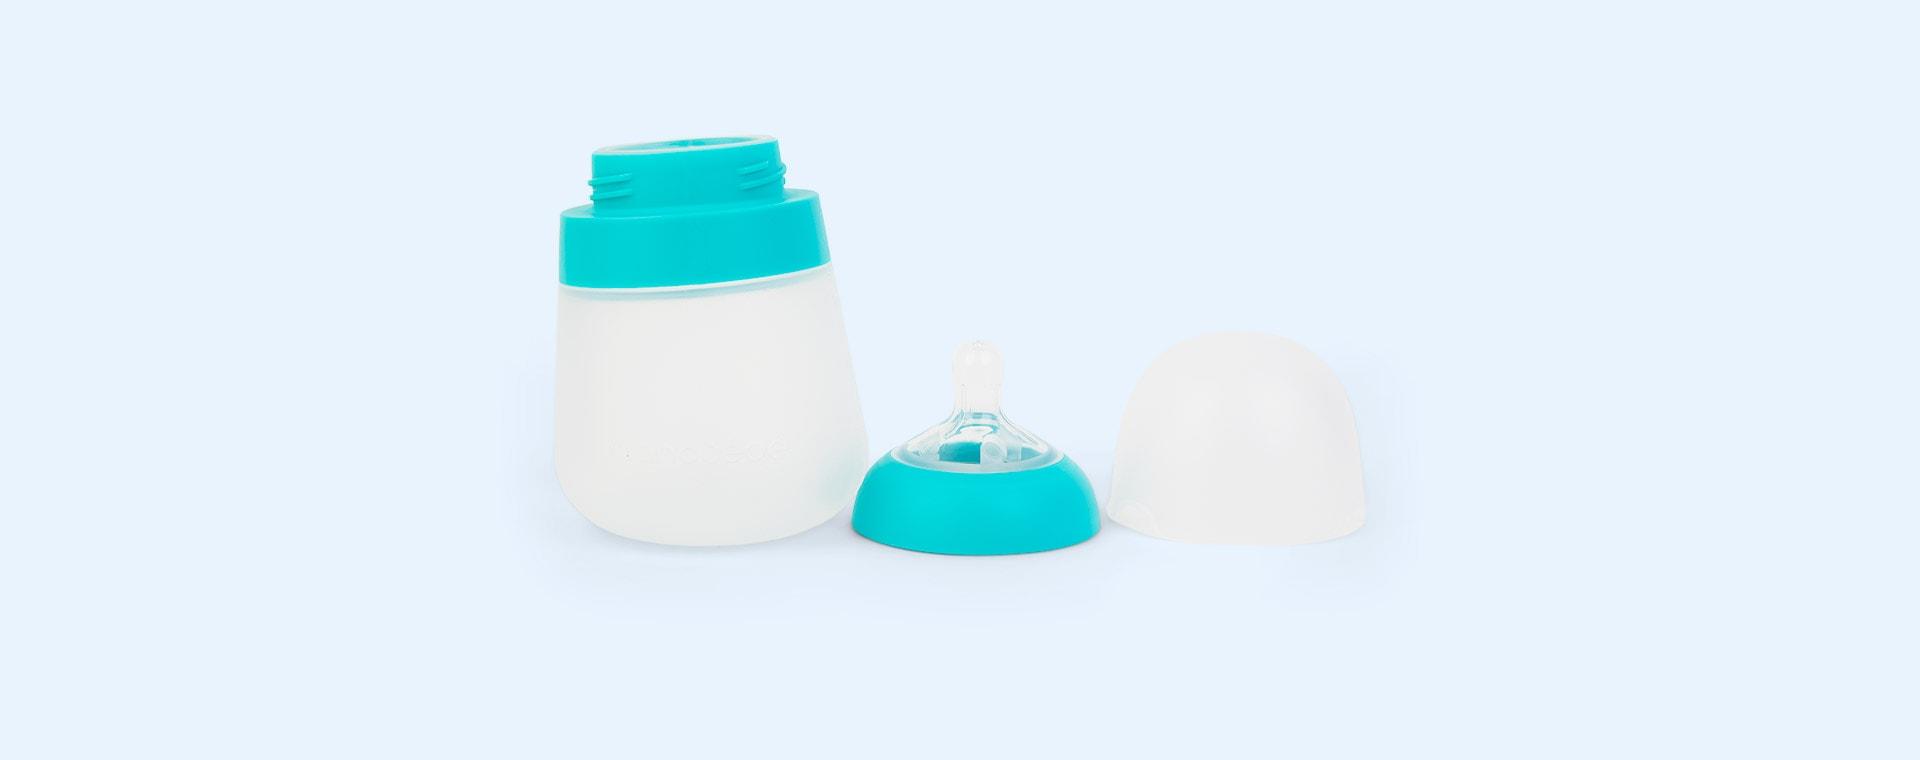 Teal nanobébé 3-Pack Flexy Silicone Baby Bottles